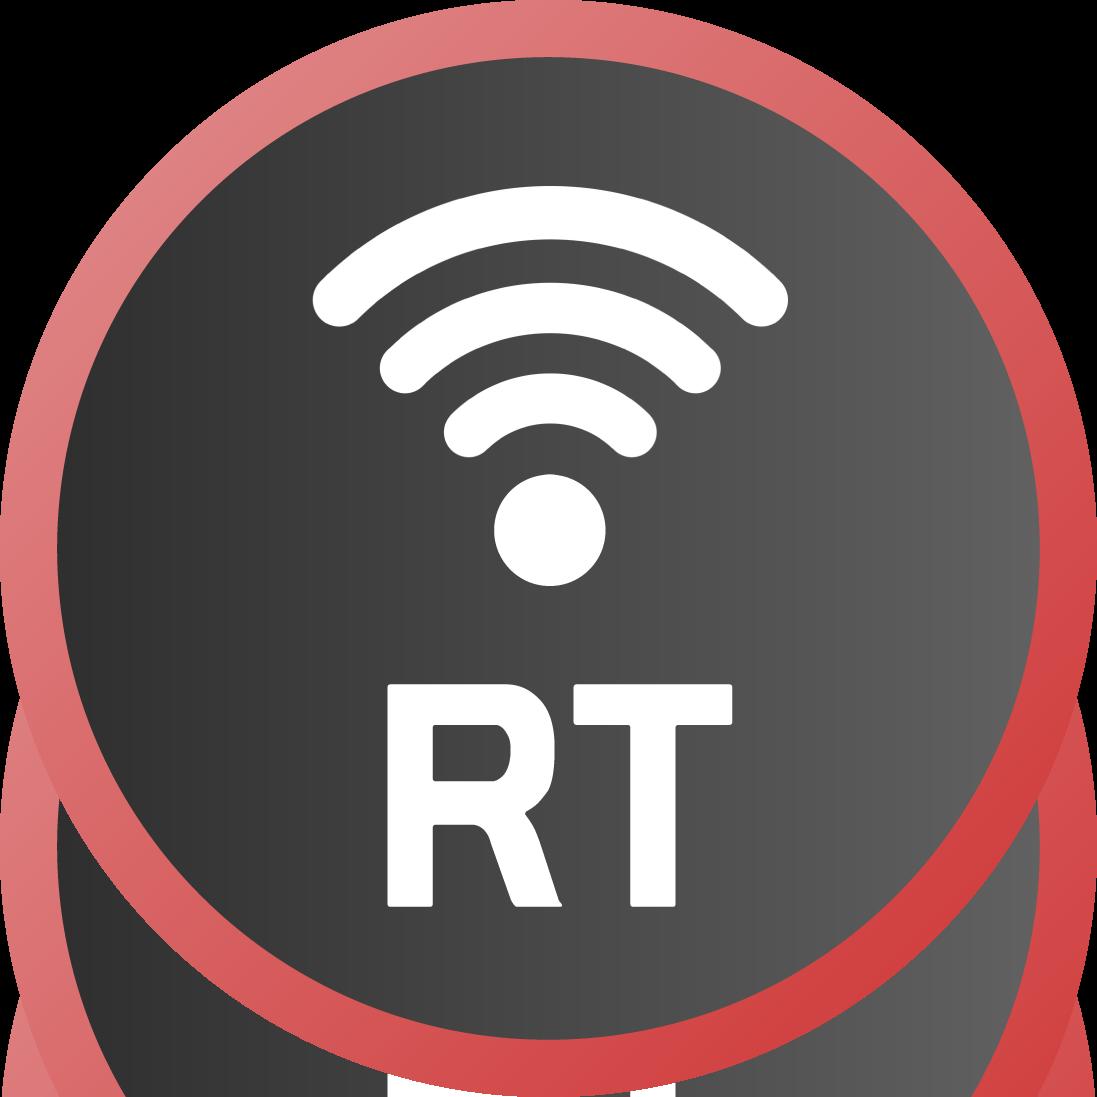 Wifi_RT